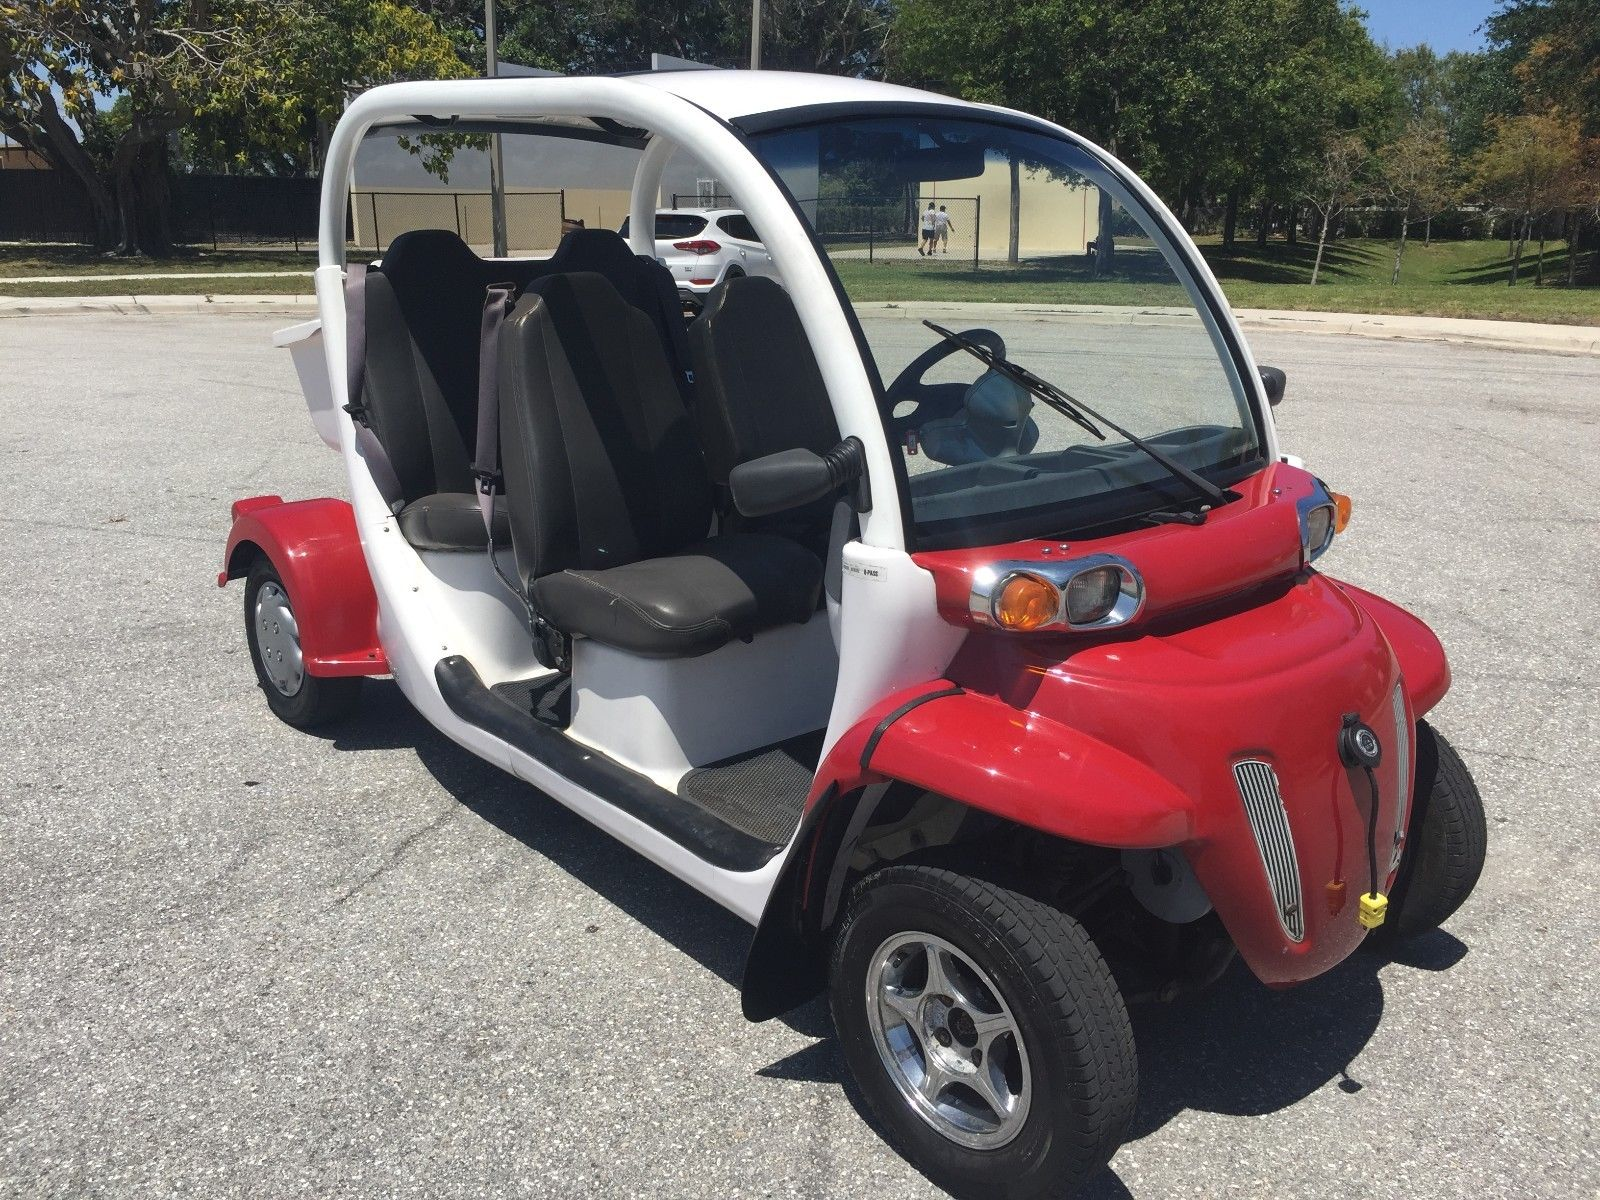 Polaris Gem For Sale >> good tires 2012 Polaris gem E4 LSV 4 Passenger SEAT GOLF CART for sale